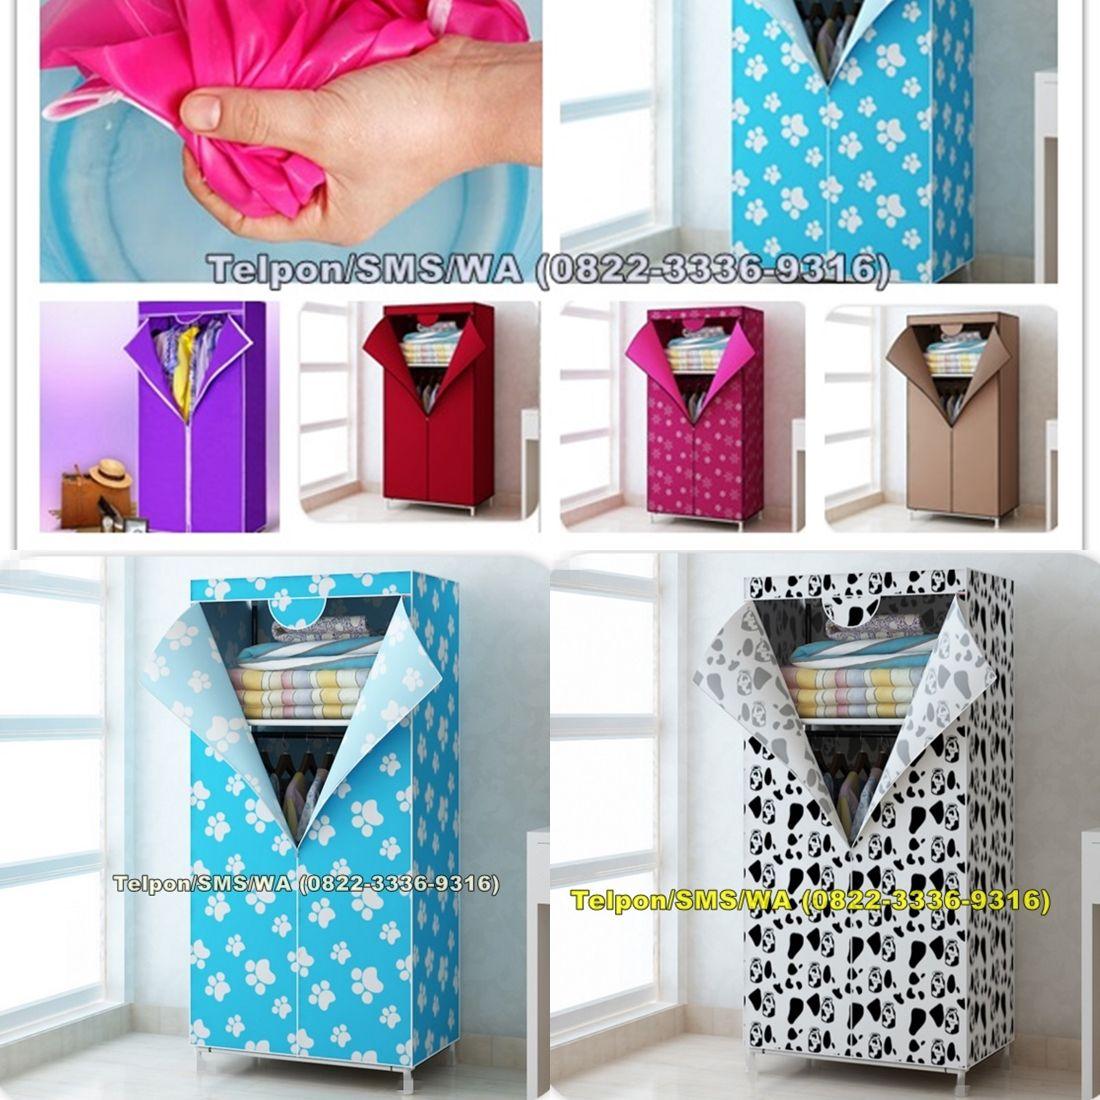 Lemari Baju Portable